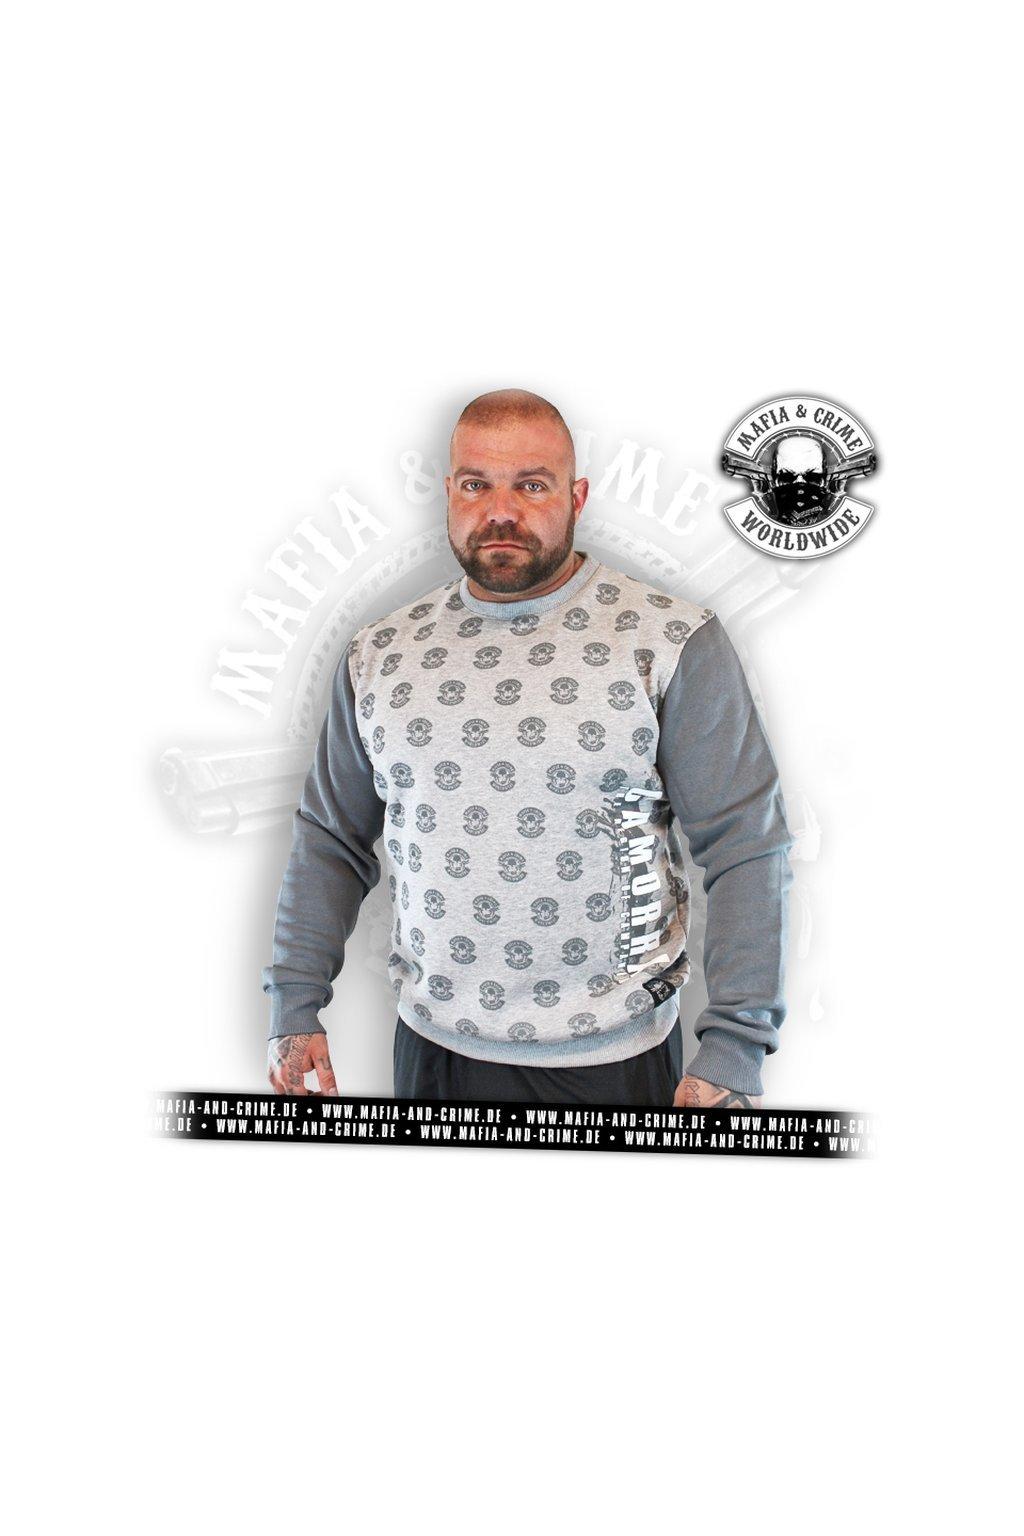 Pánská mikina Mafia & Crime Camorra Sweater obr1